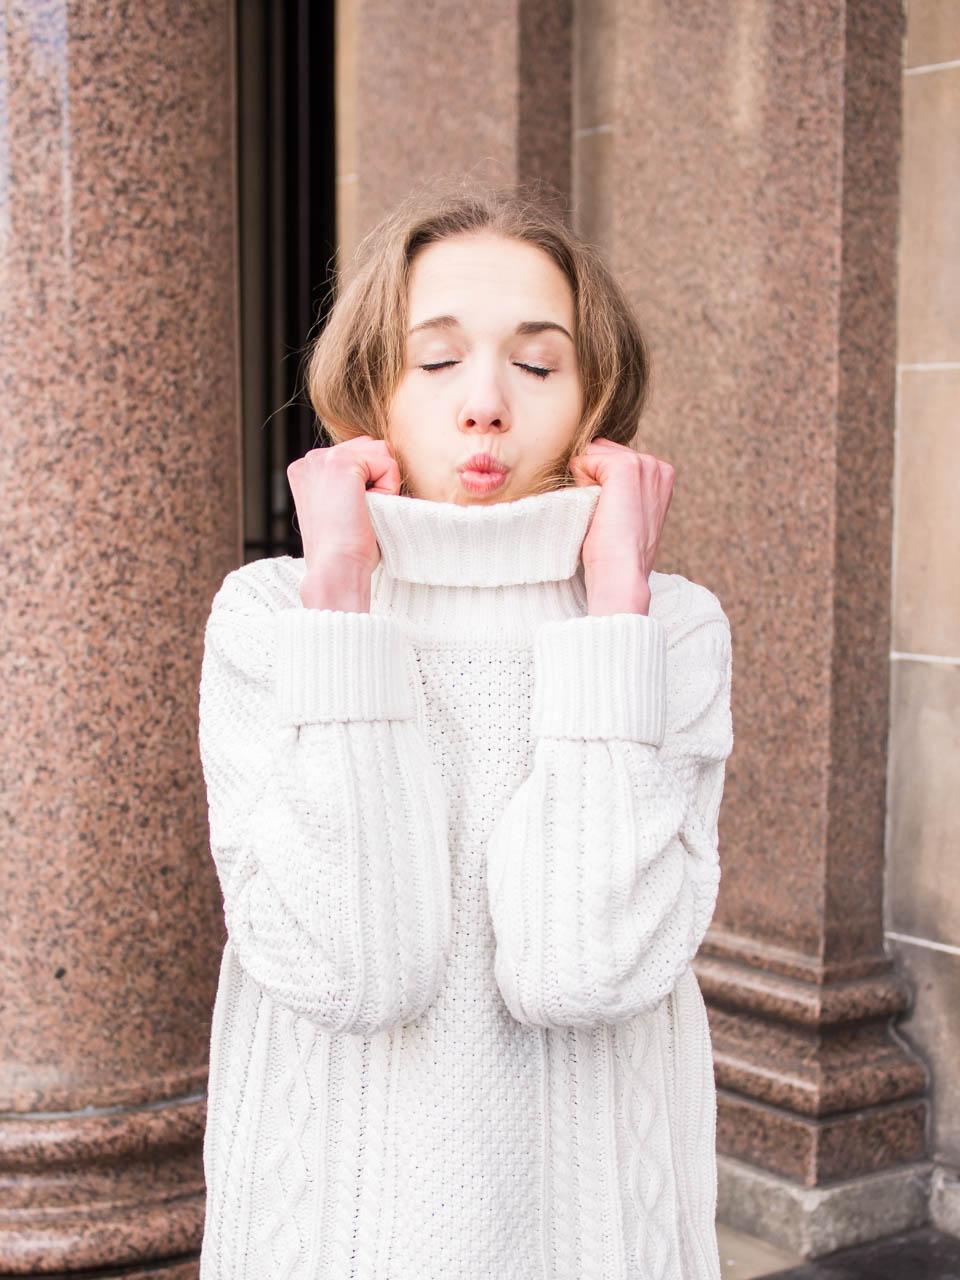 White cable knit jumper, winter fashion - valkoinen palmikkoneule, talvi, muoti, bloggaaja